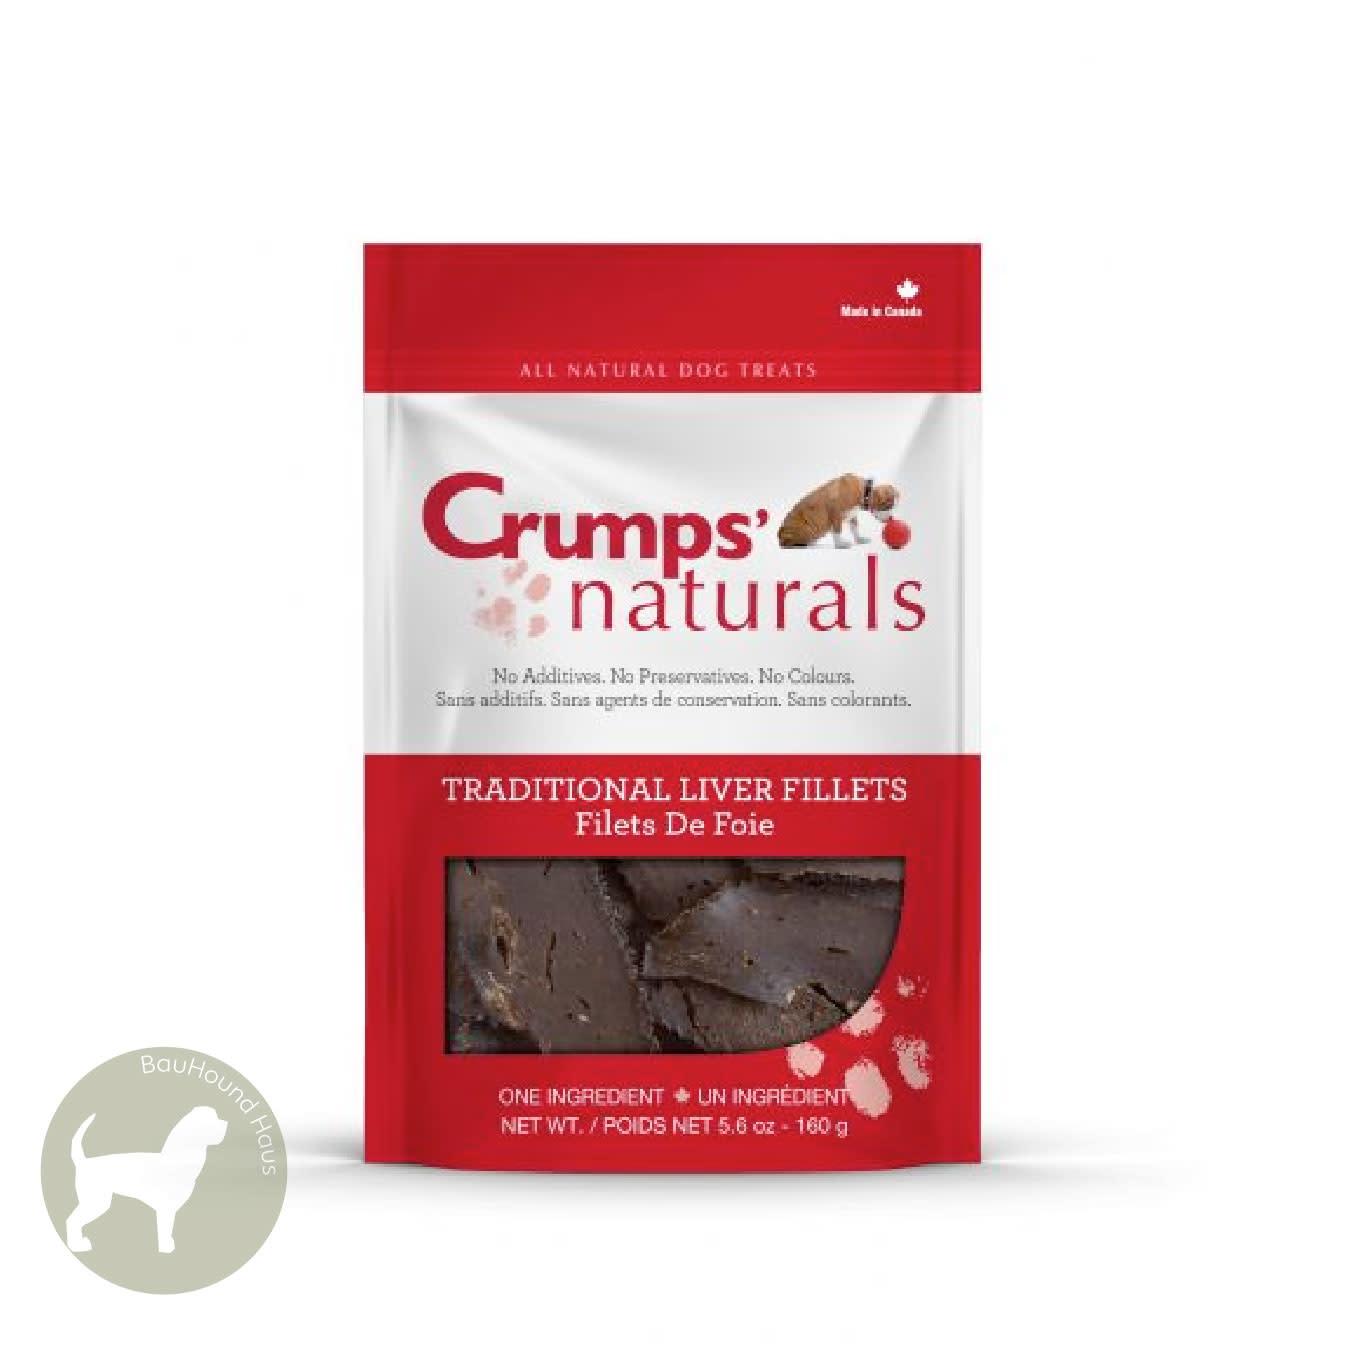 Crumps Crumps Natural Beef Liver Fillet, 160g